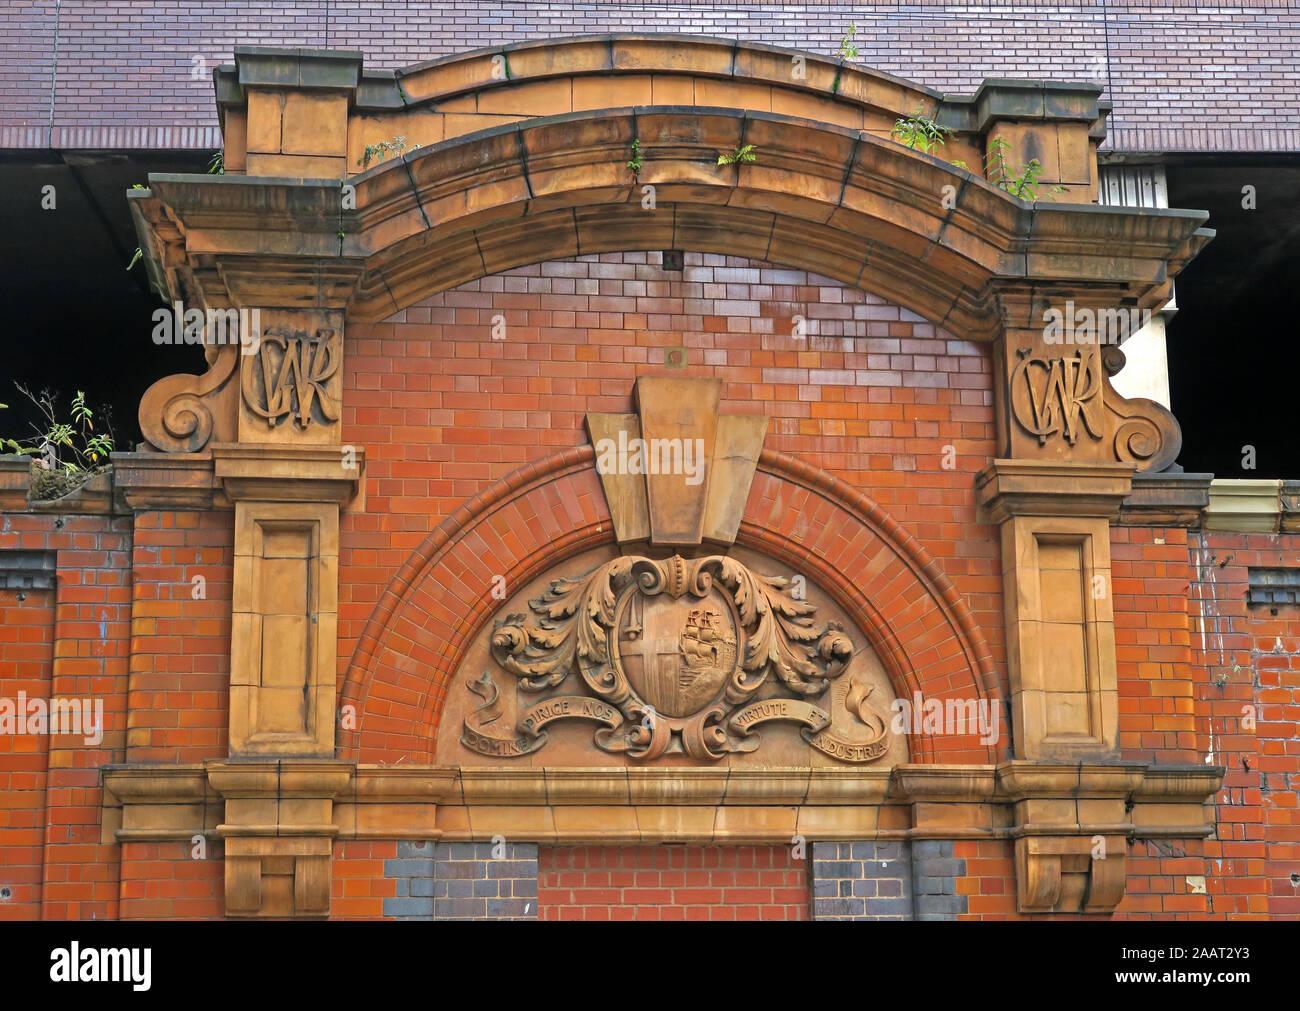 GWR frontage brick and stonework, Snow Hill station, Birmingham City Centre, West Midlands, B3 2BJ Stock Photo